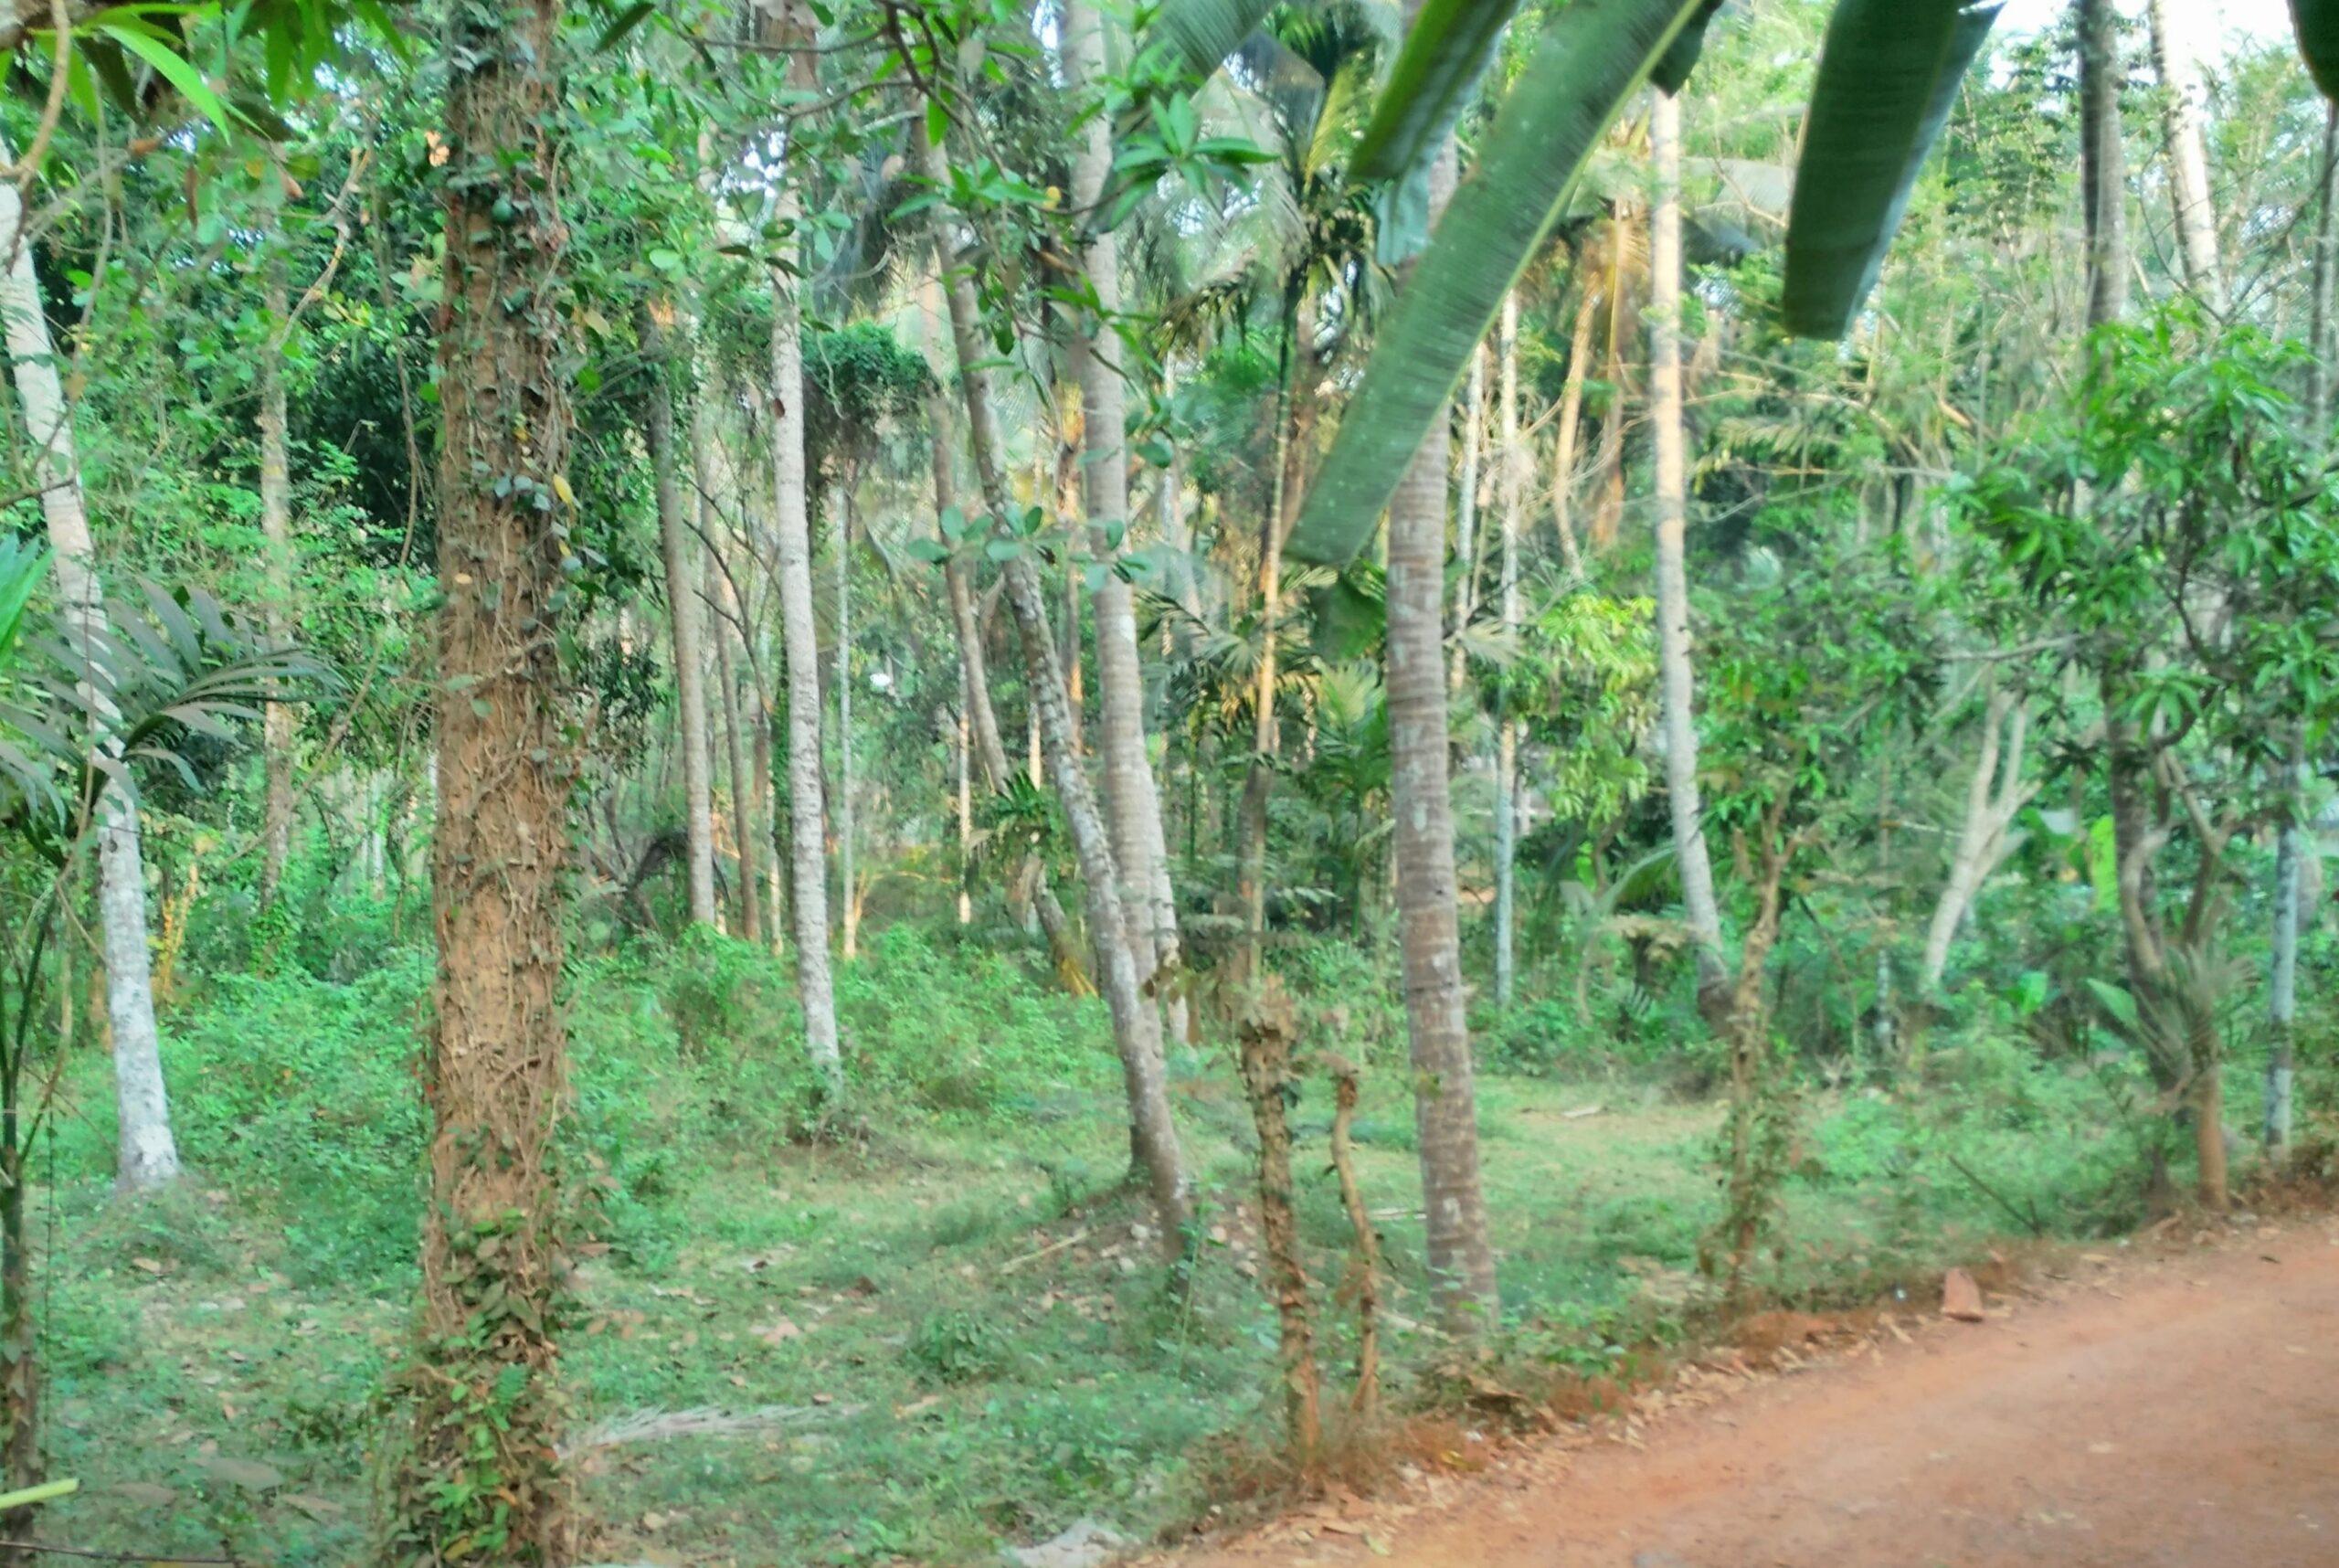 20 Cents Residential land in Iringal near National Highway, Vatakara